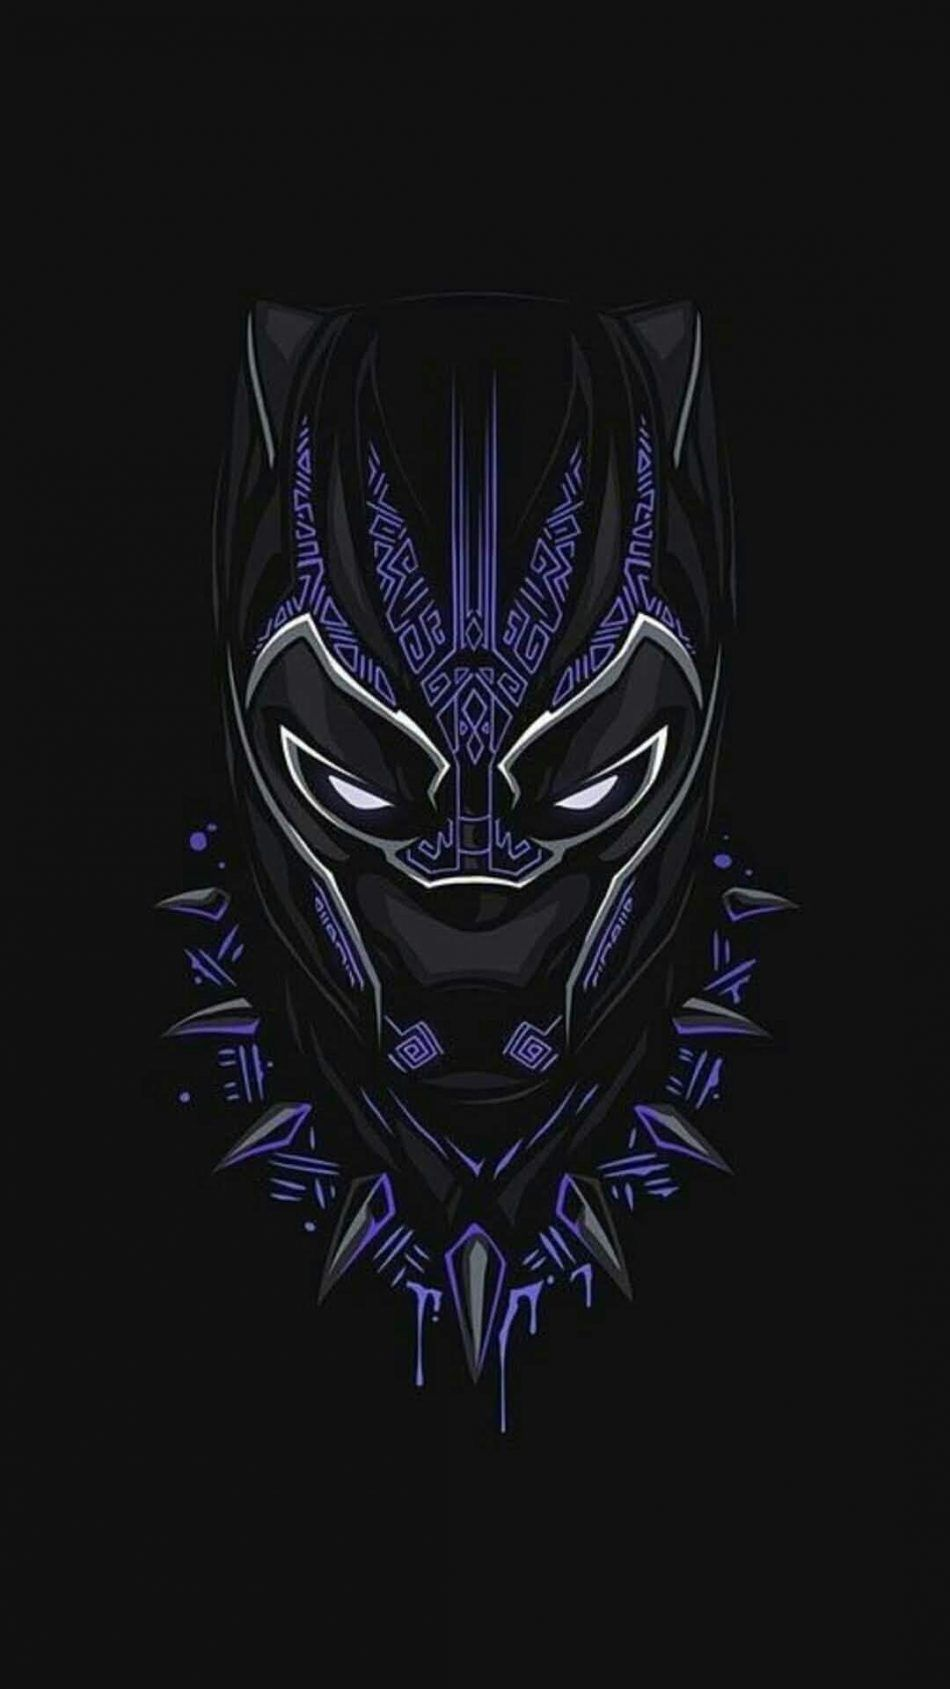 Film Review Black Panther Strange Harbors Black Panther Hd Wallpaper Black Panther Marvel Black Panther Tattoo